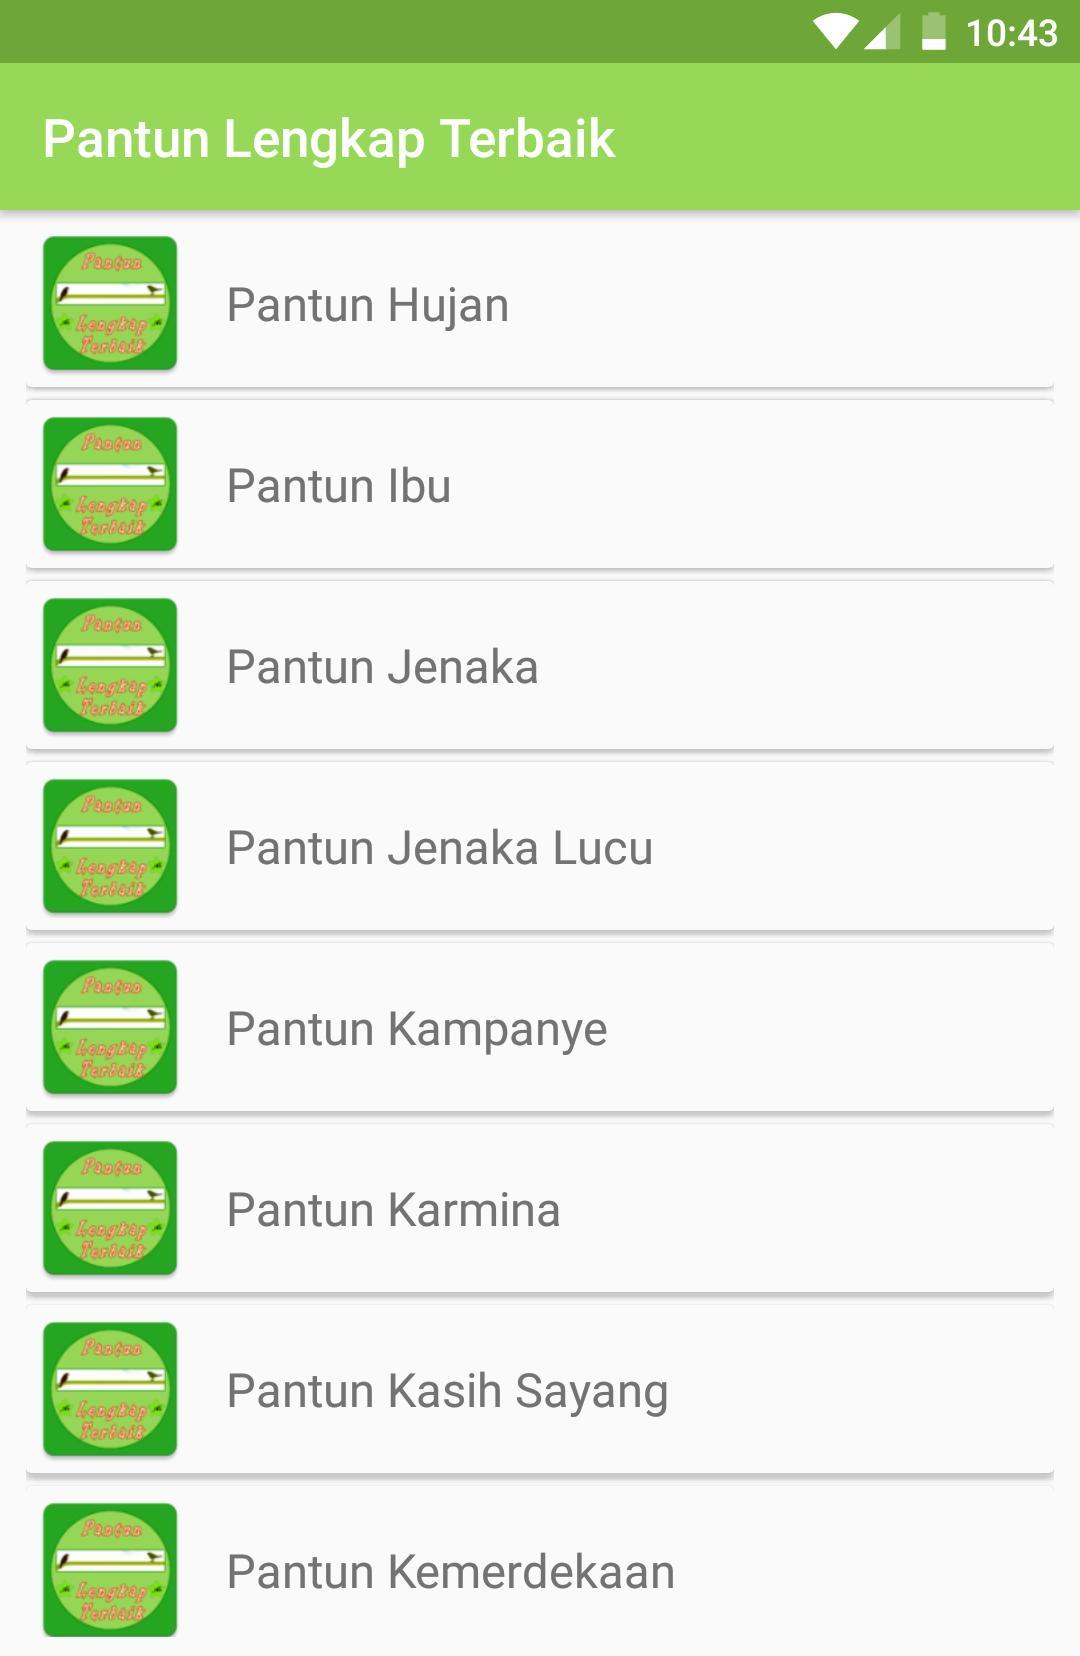 Pantun Lengkap Terbaik para Android APK Baixar